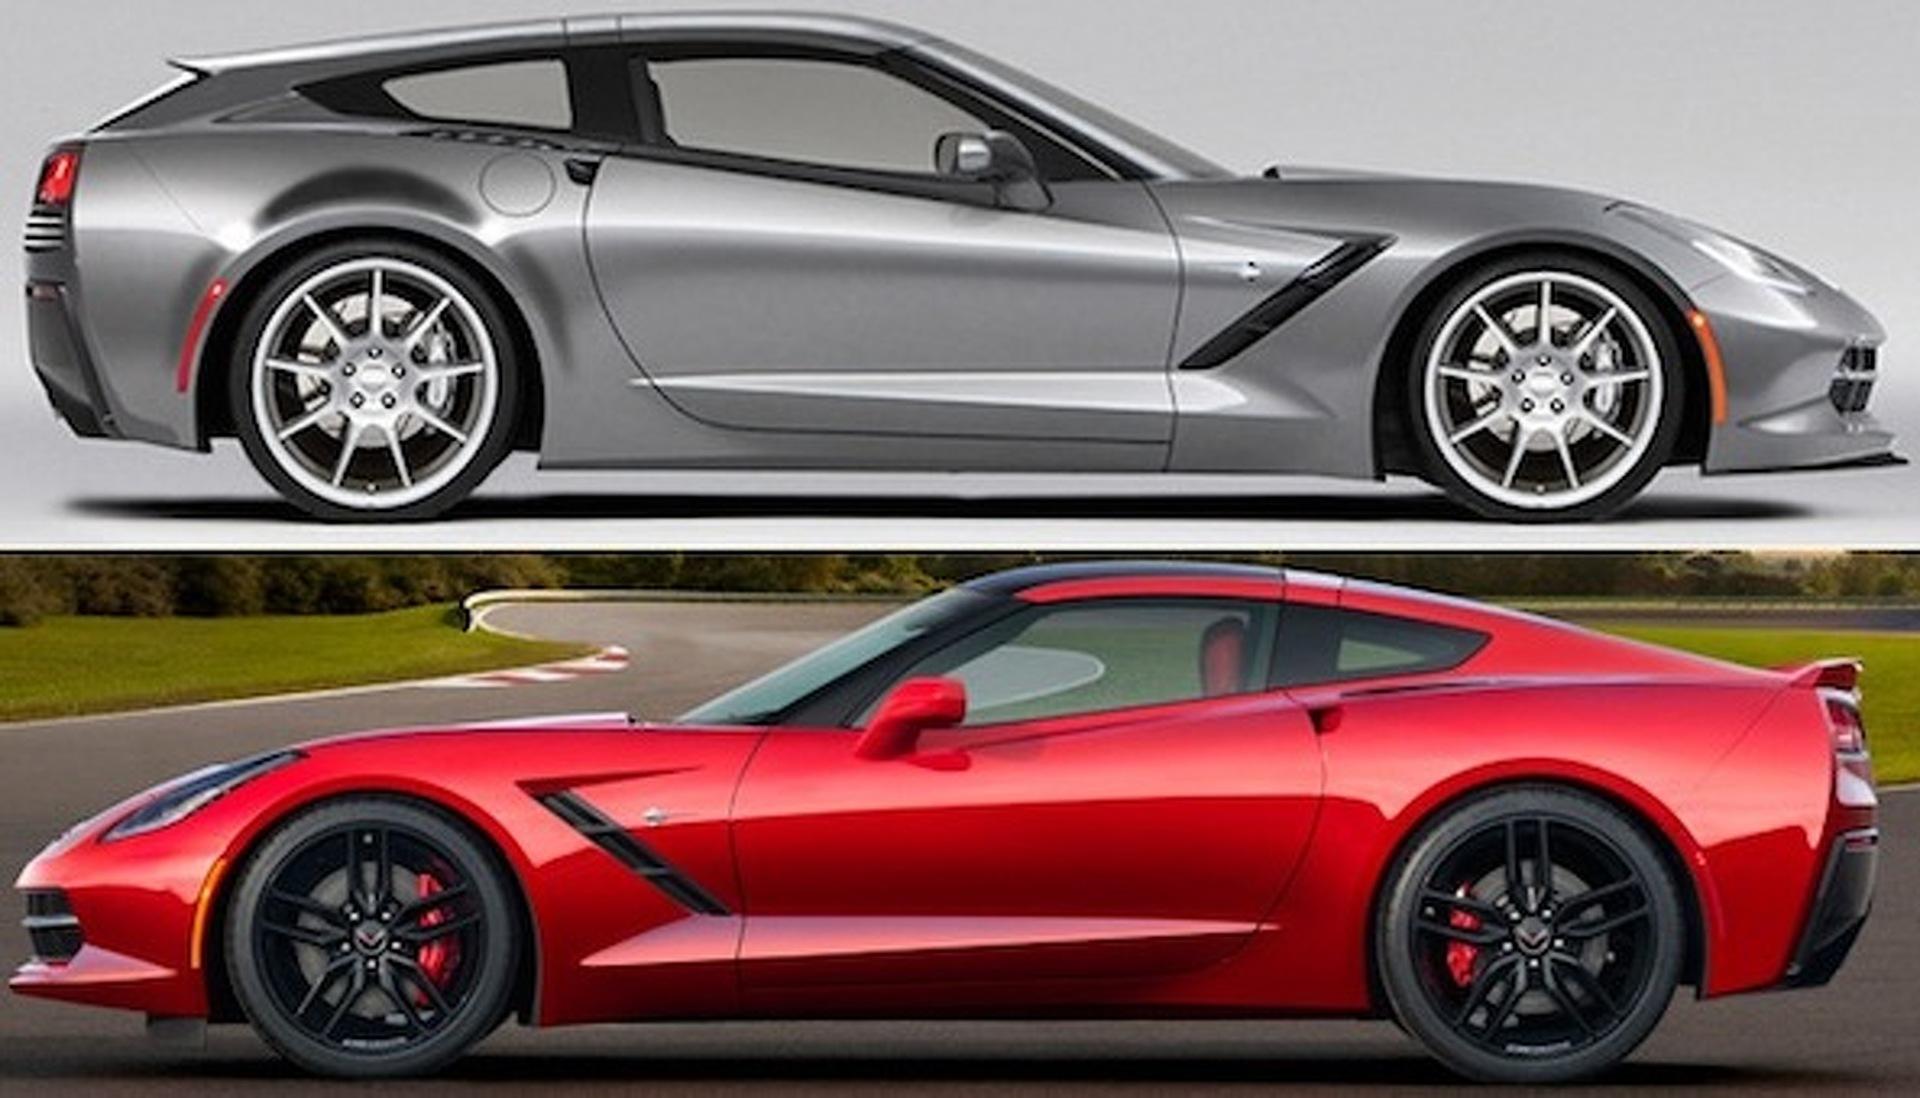 Callaway Corvette Stingray AeroWagon Might Actually Be Produced